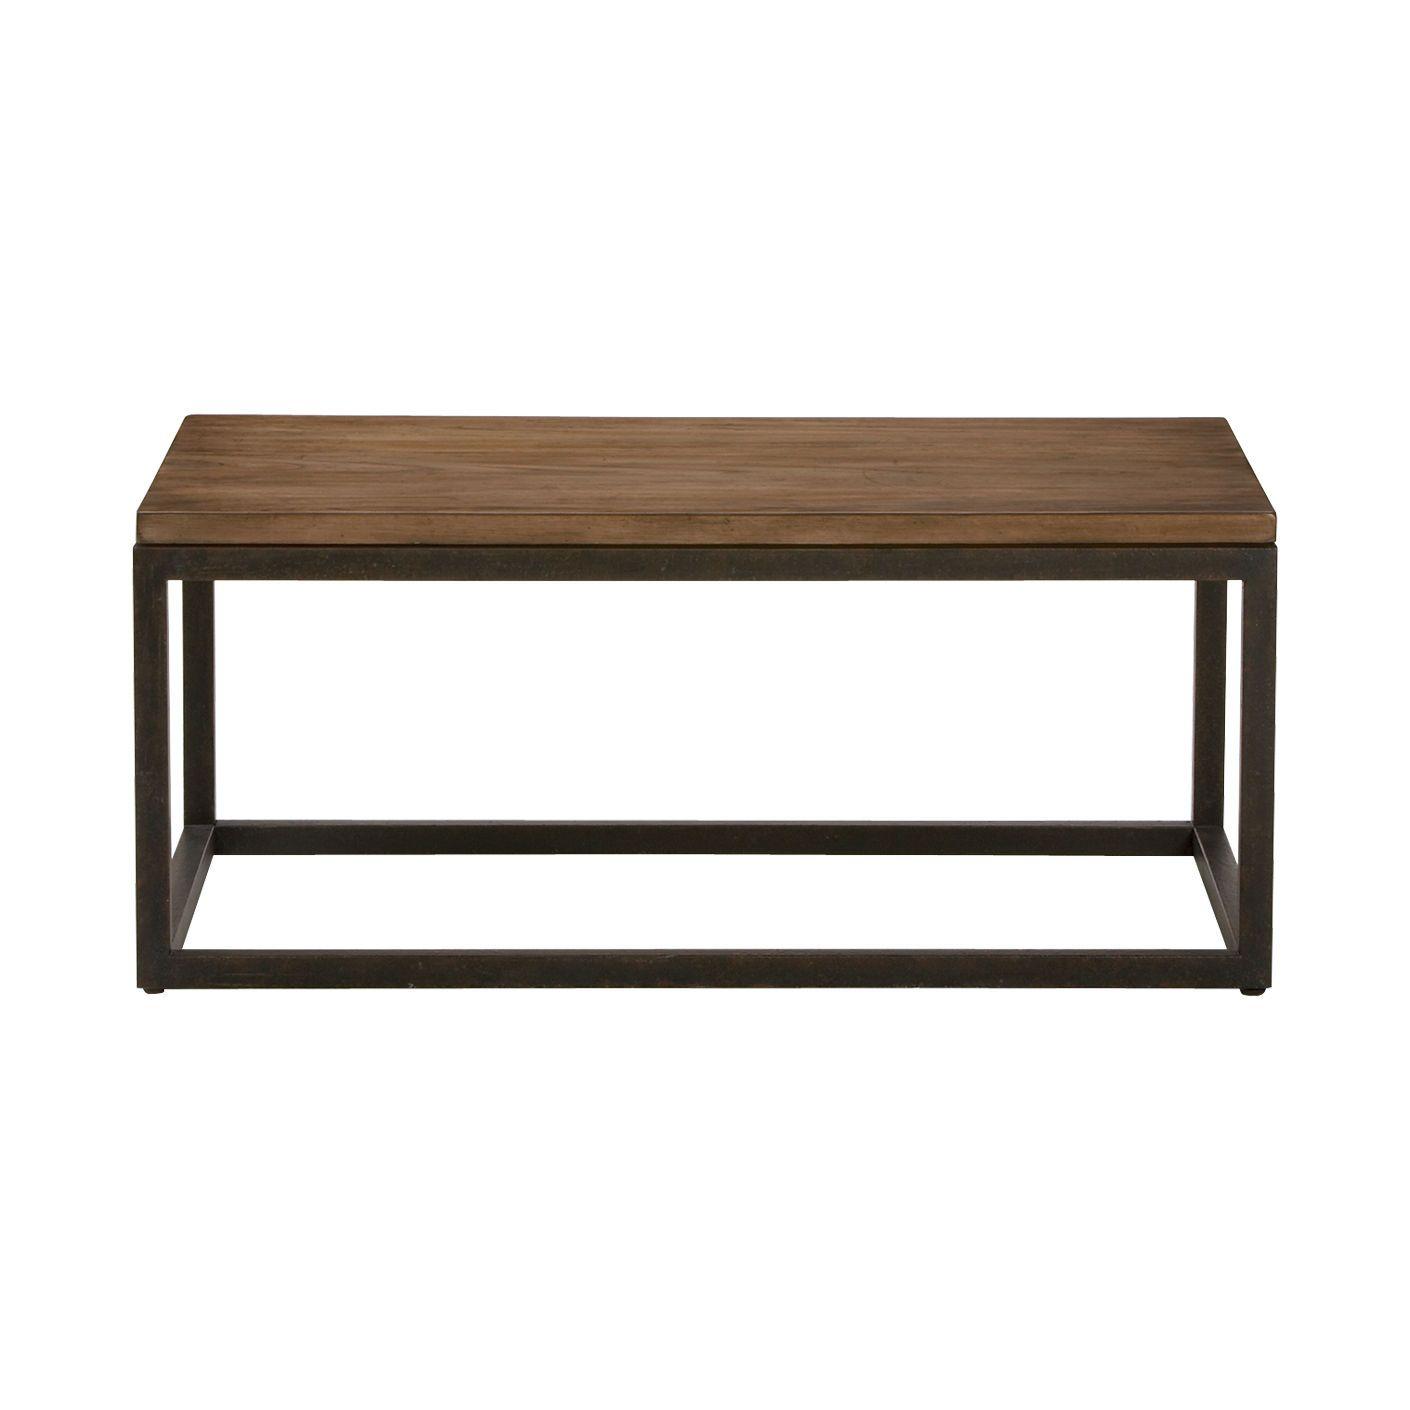 Ethan Allen Rectangular Coffee Tables: Meyer Small Coffee Table - Ethan Allen US